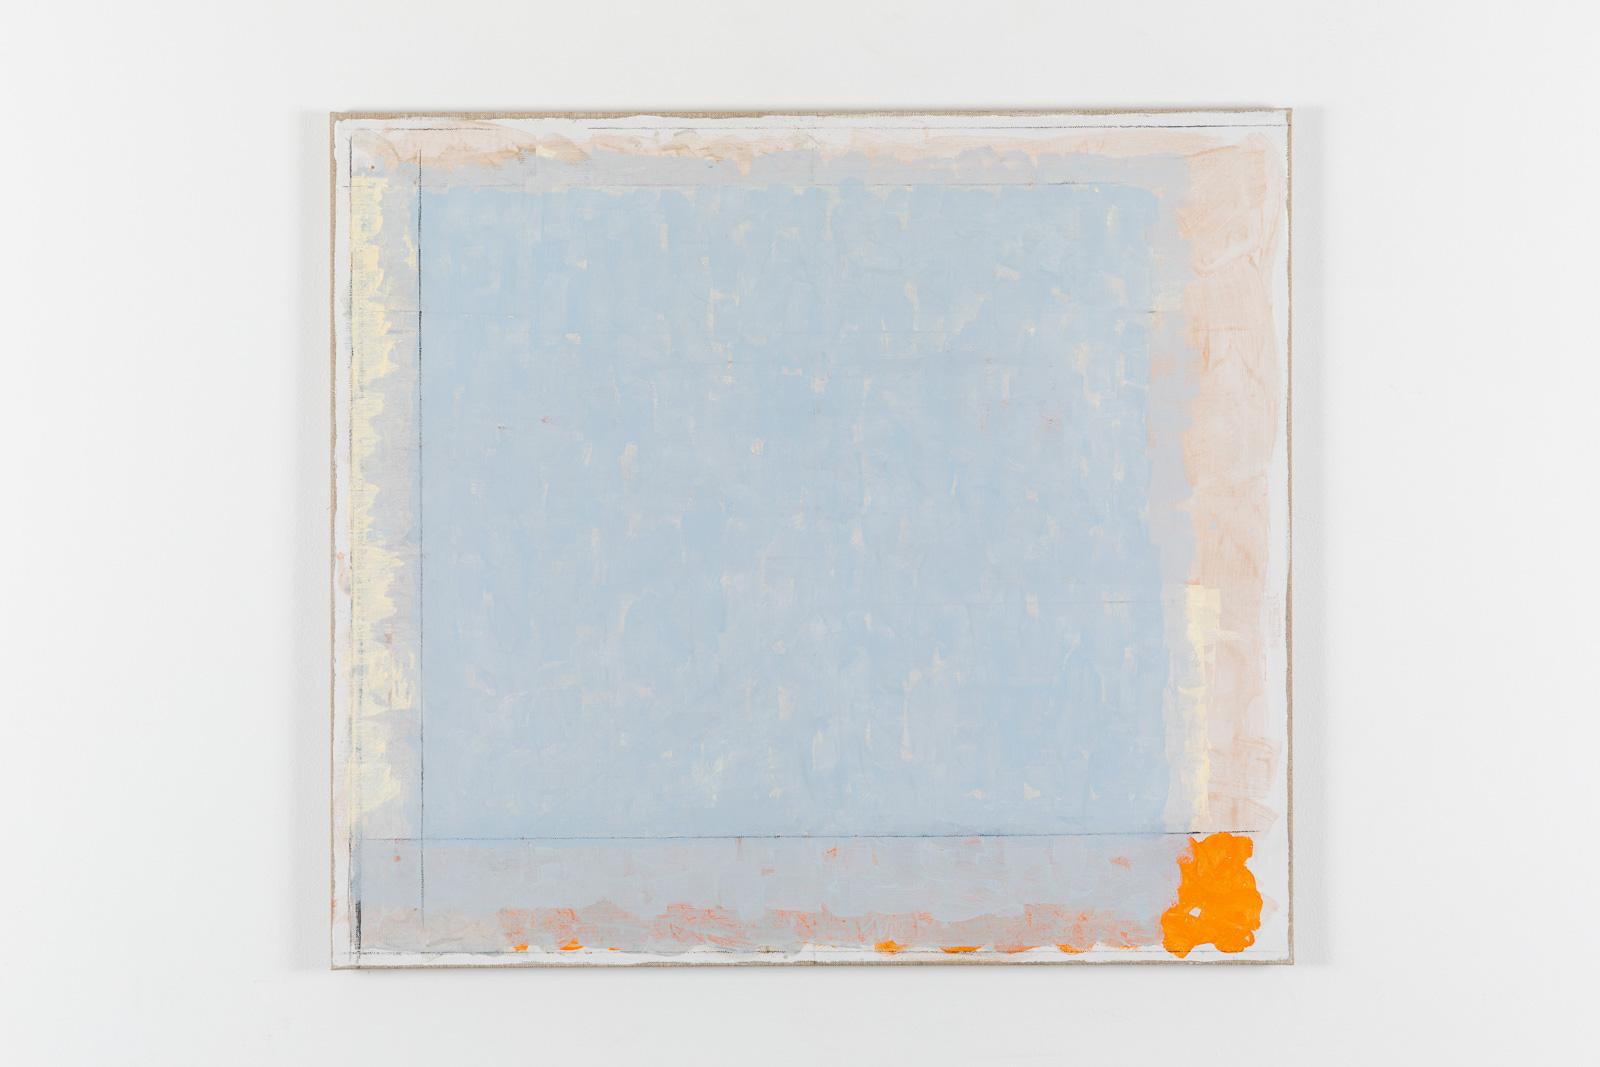 Vila Ziza 14, 2018, Egg tempera on canvas, 80 x 90 cm